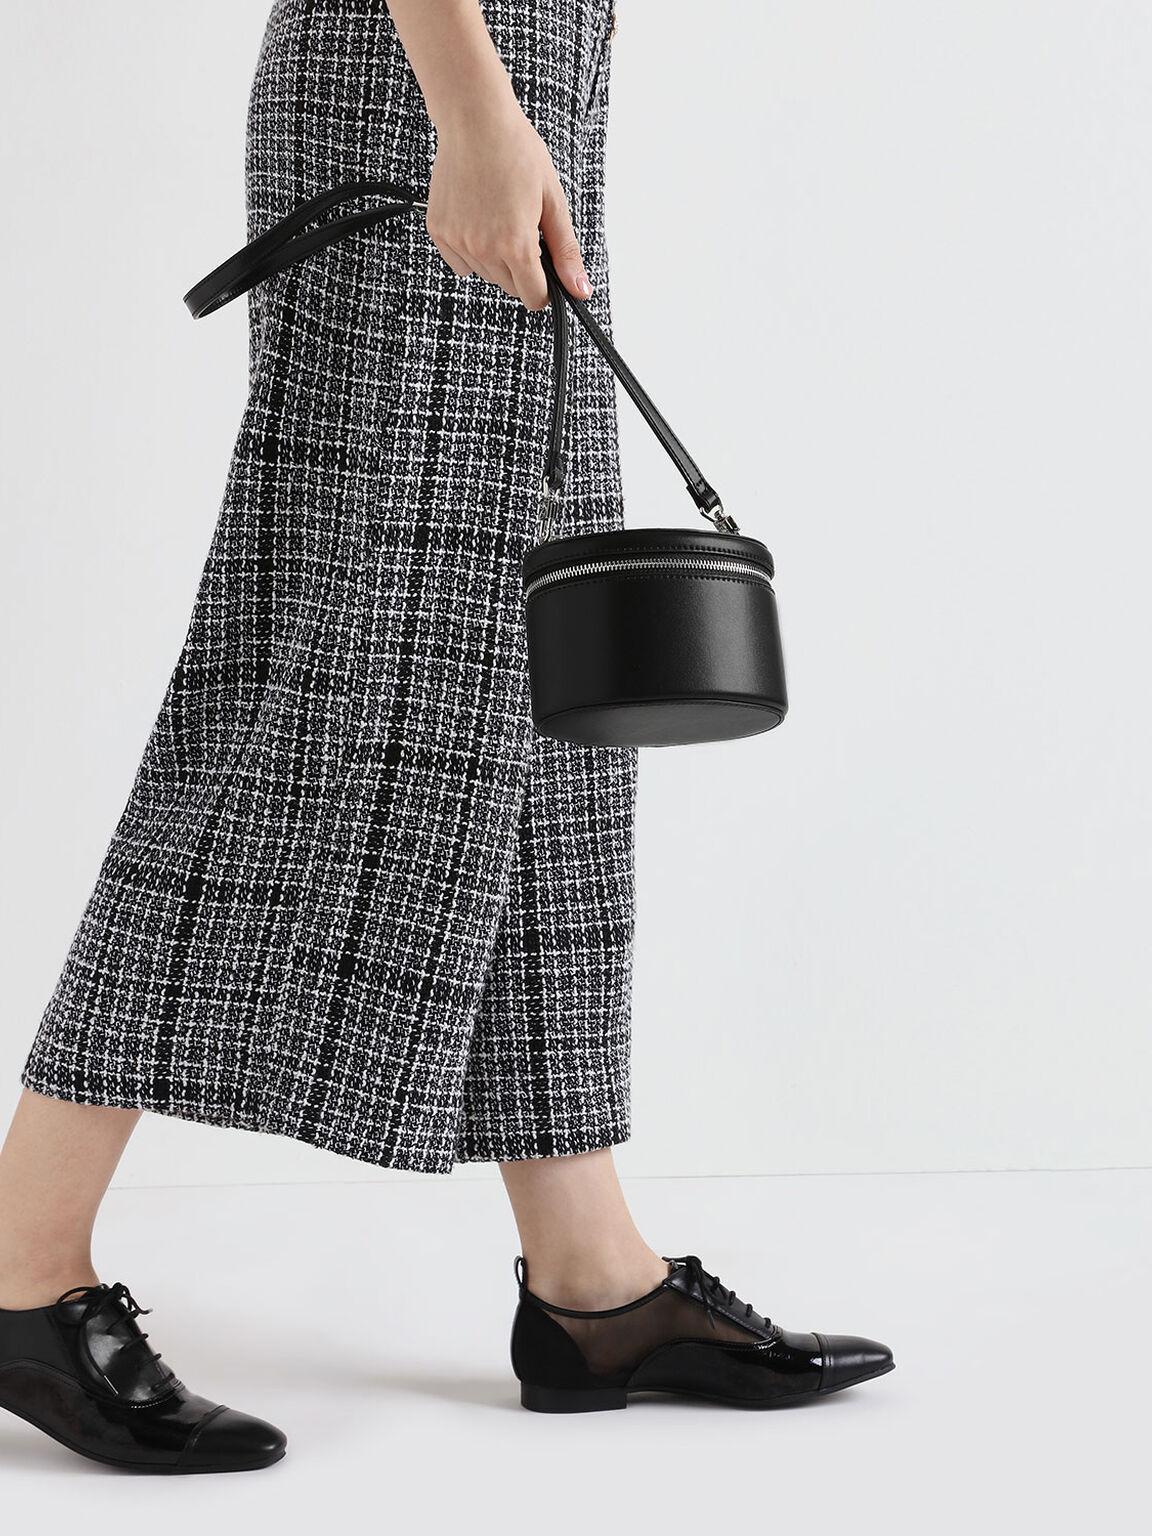 Wrinkled Patent Mesh Oxford Shoes, Black, hi-res